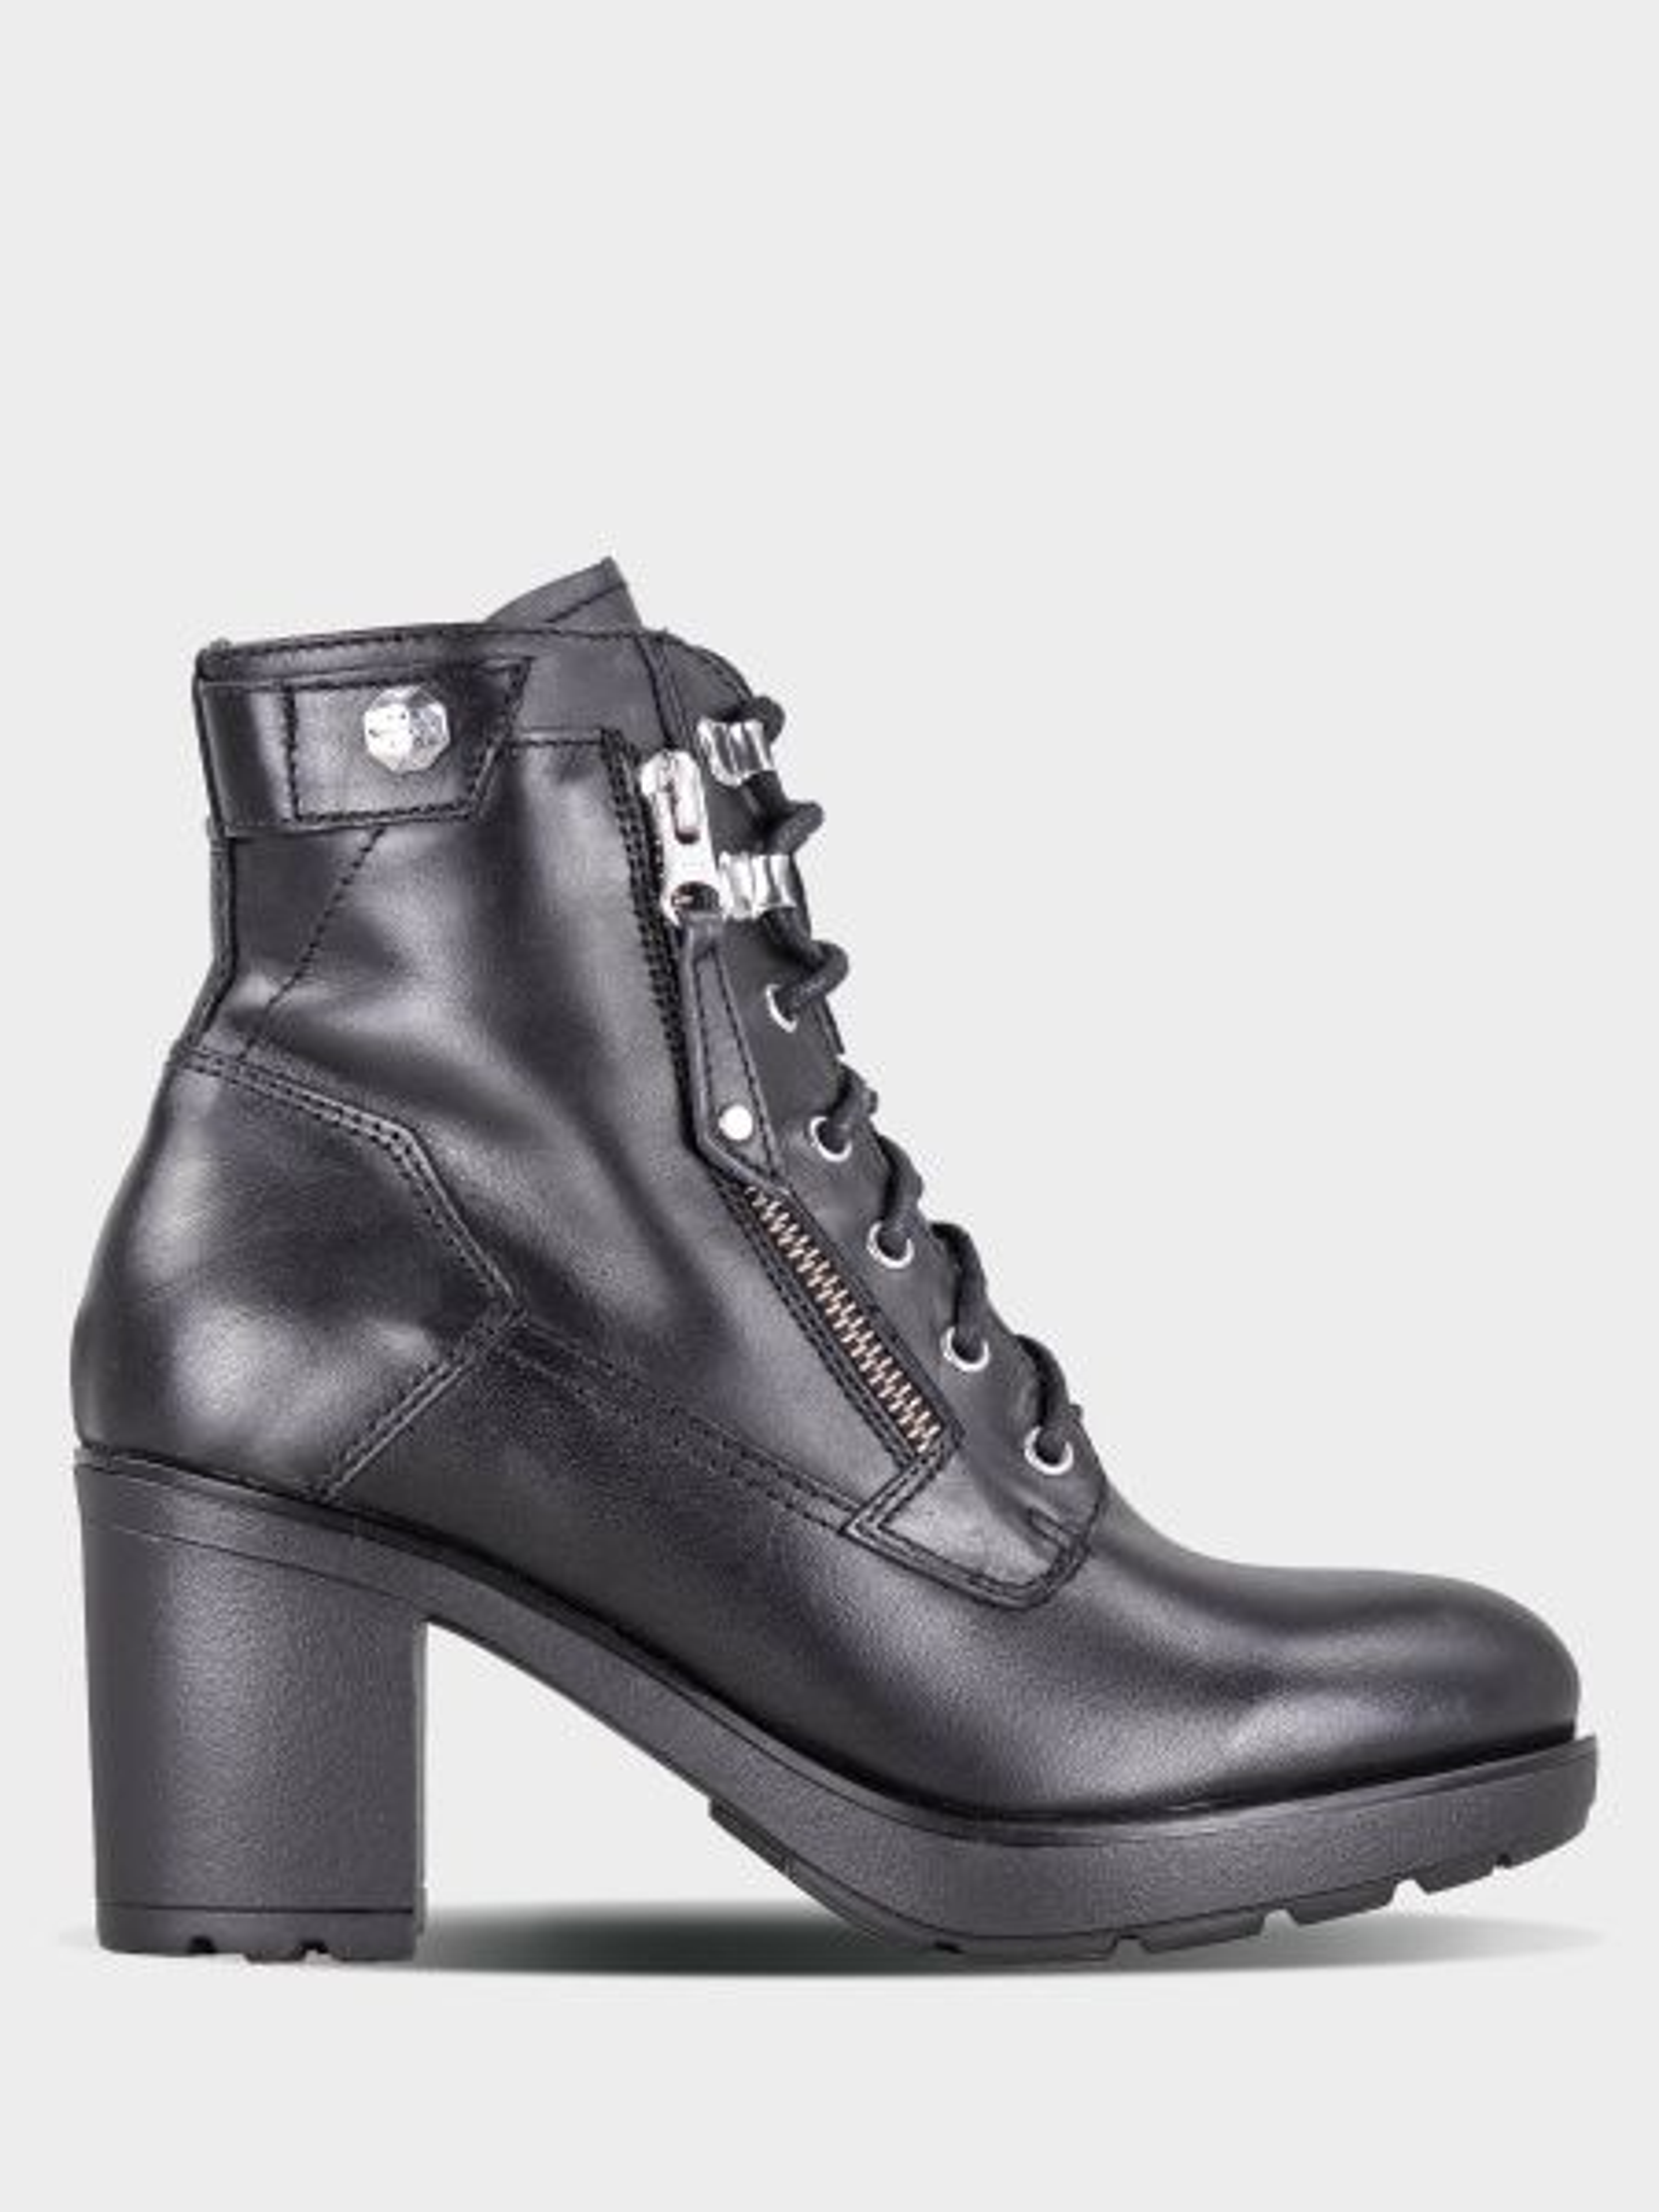 Ботинки женские NeroGiardini NM21 размерная сетка обуви, 2017